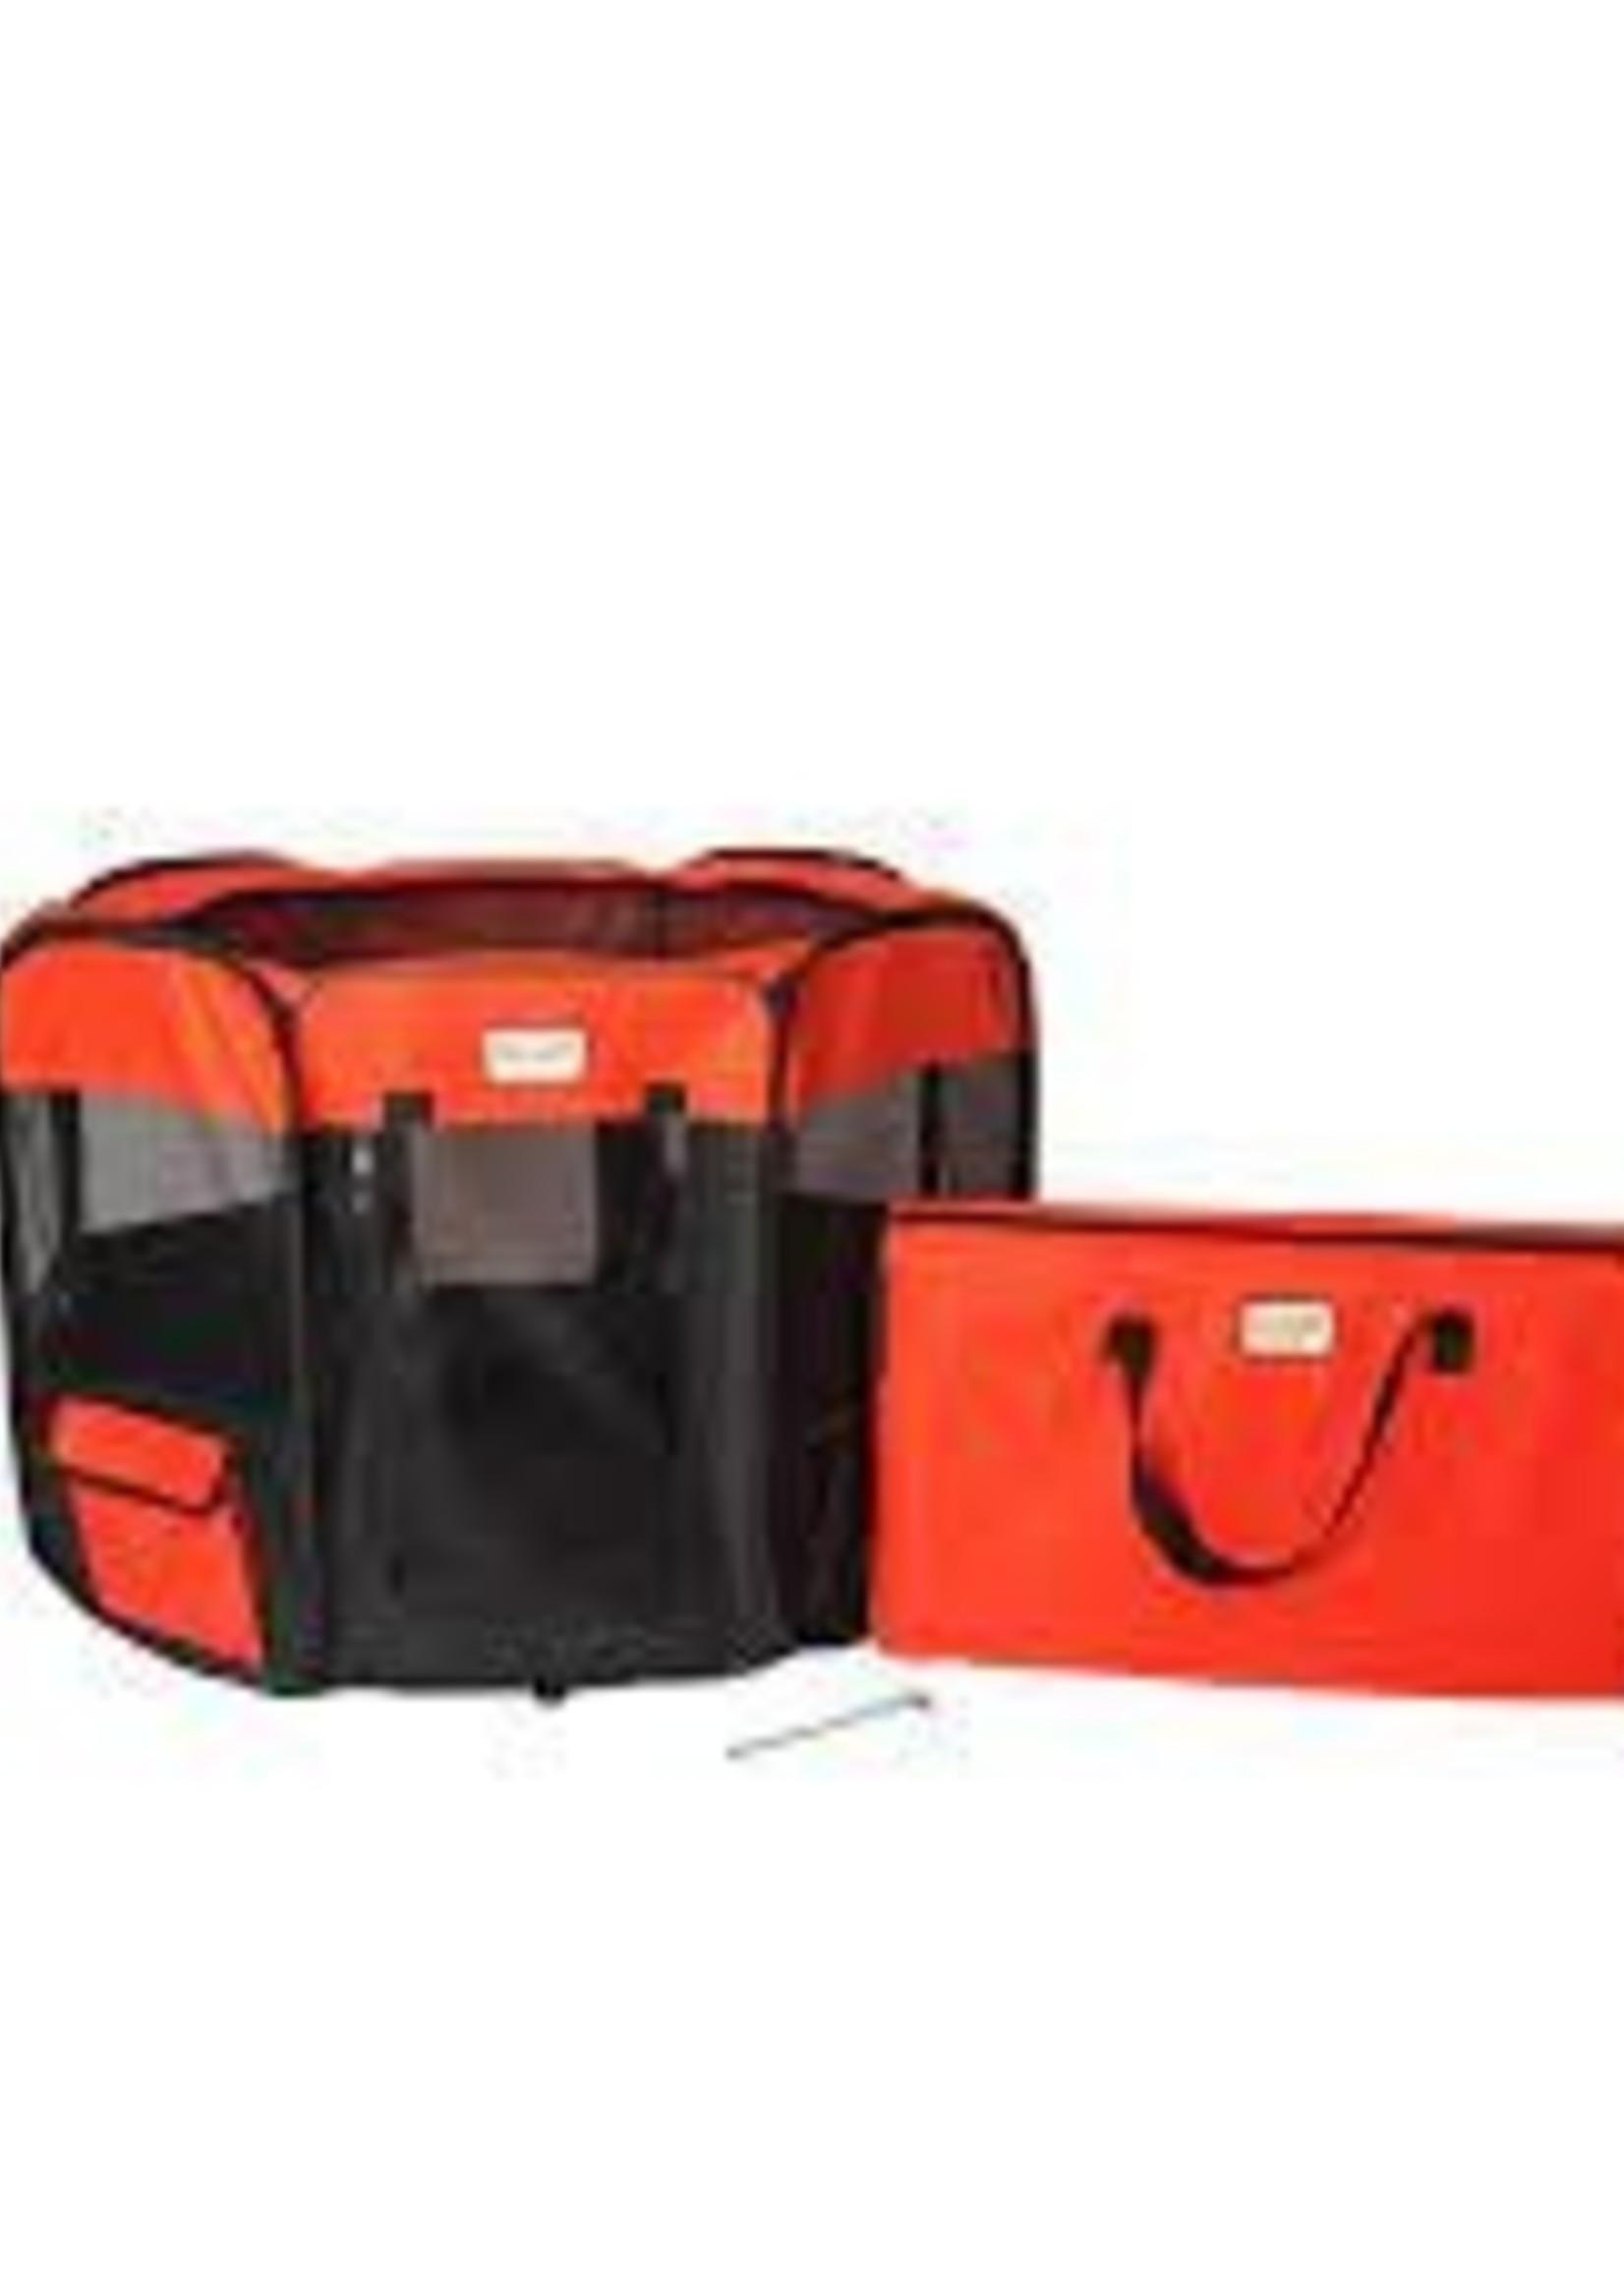 Armarkat Armarkat XL Portable Pet Playpen/Black & Red